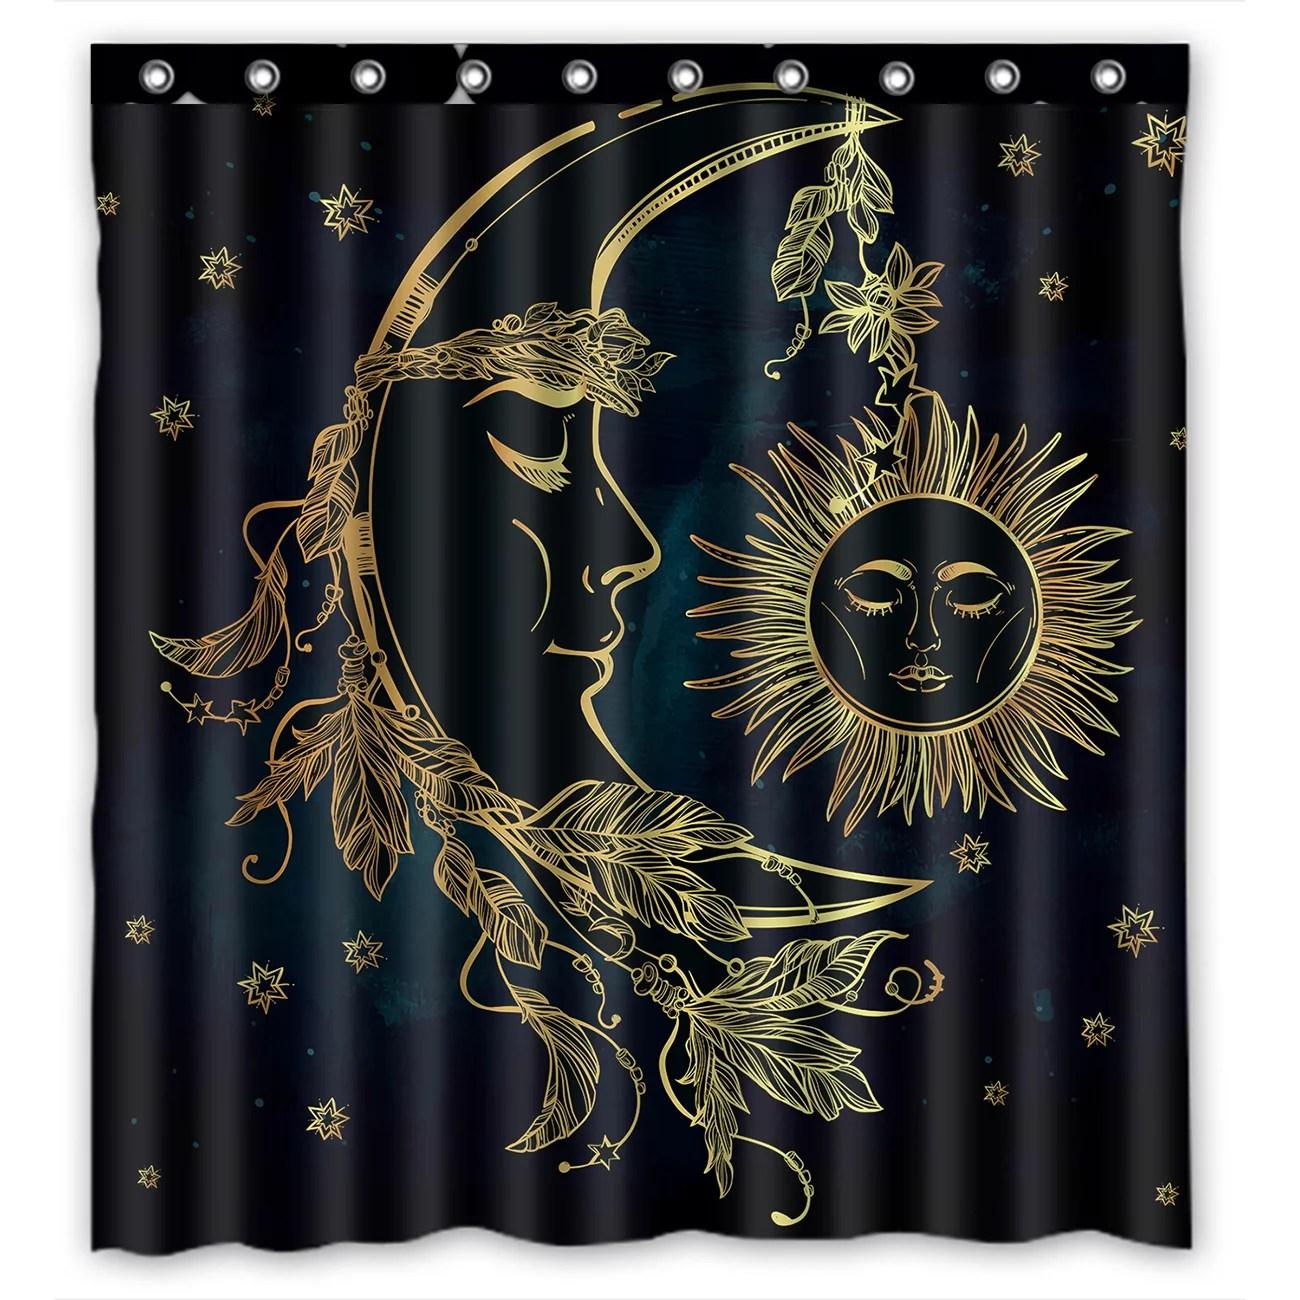 ykcg sun and moon stars starry night waterproof fabric bathroom shower curtain 66x72 inches